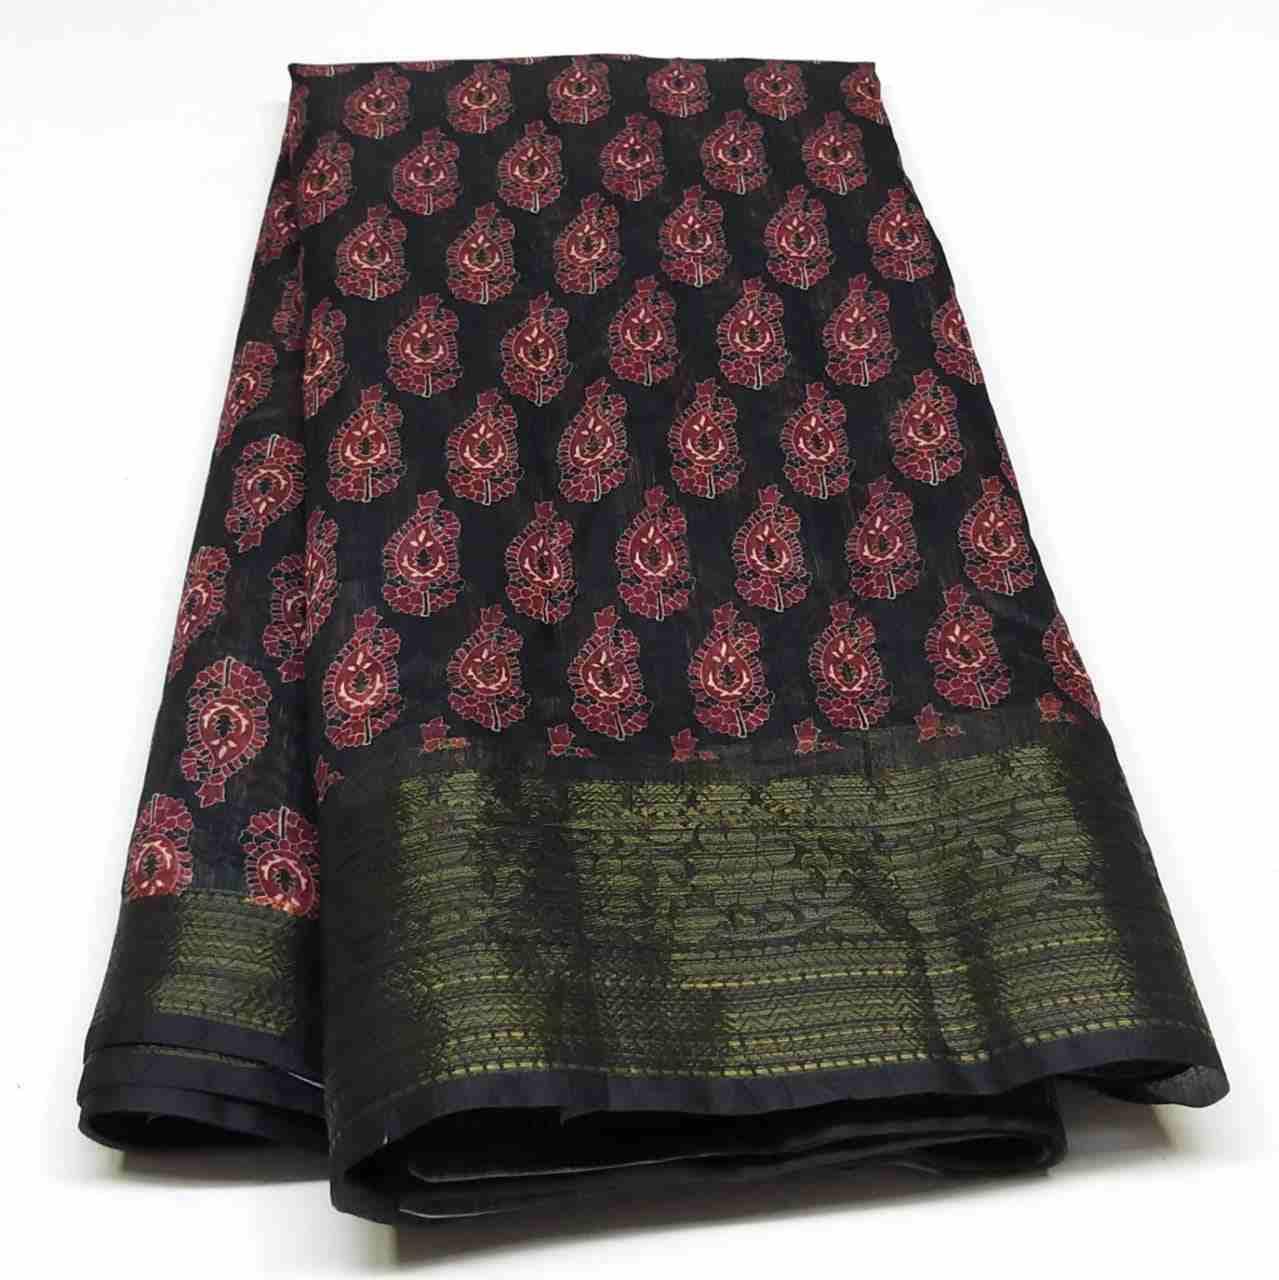 Rambha-2 Black Printed Cotton Saree